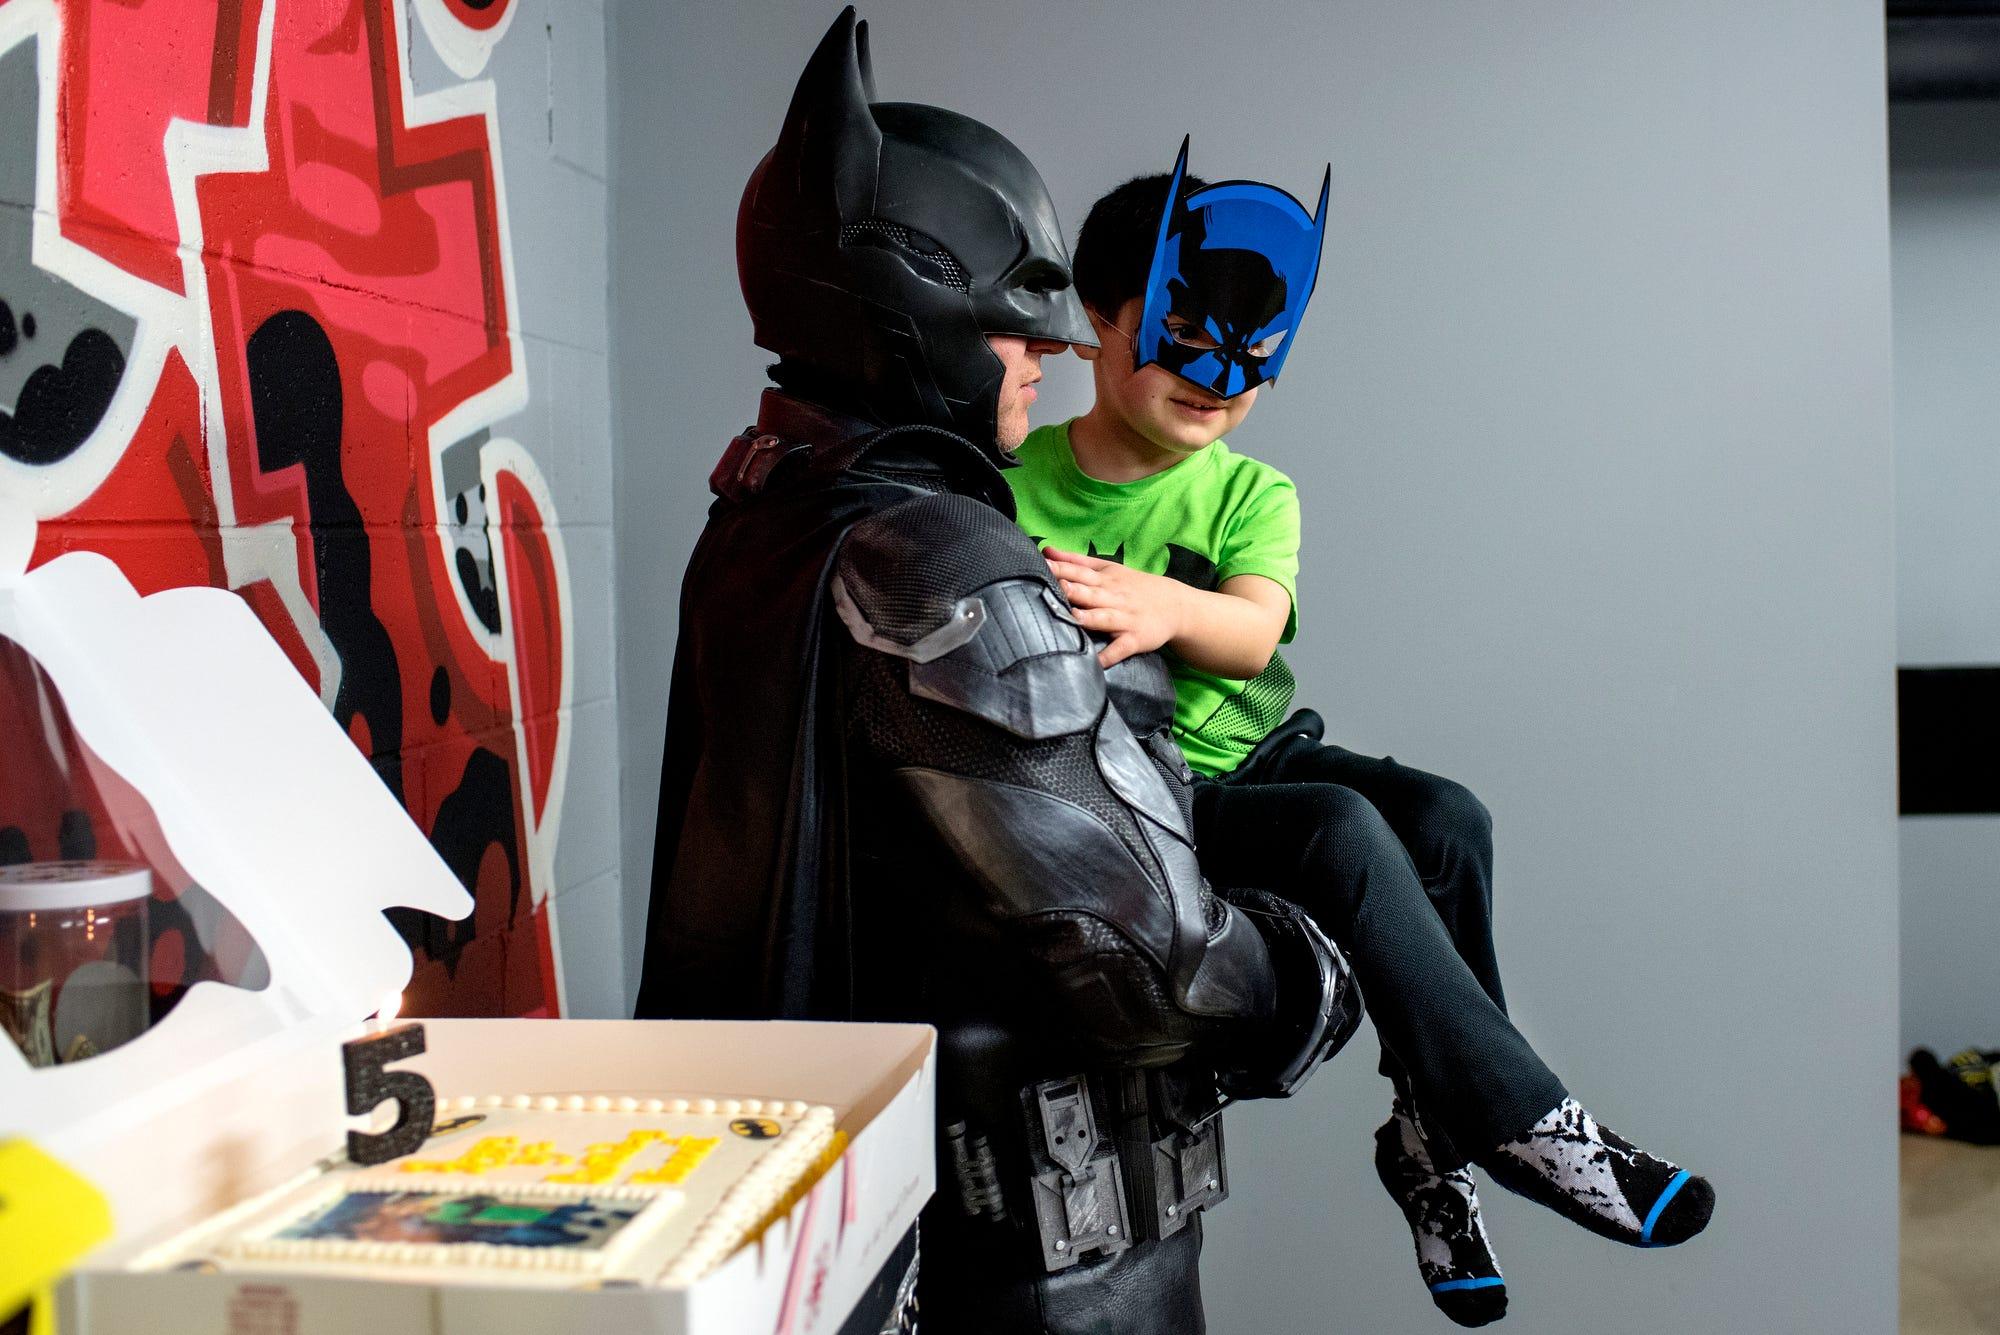 Forgiving himself was this superhero's toughest fight | Burlington Free Press